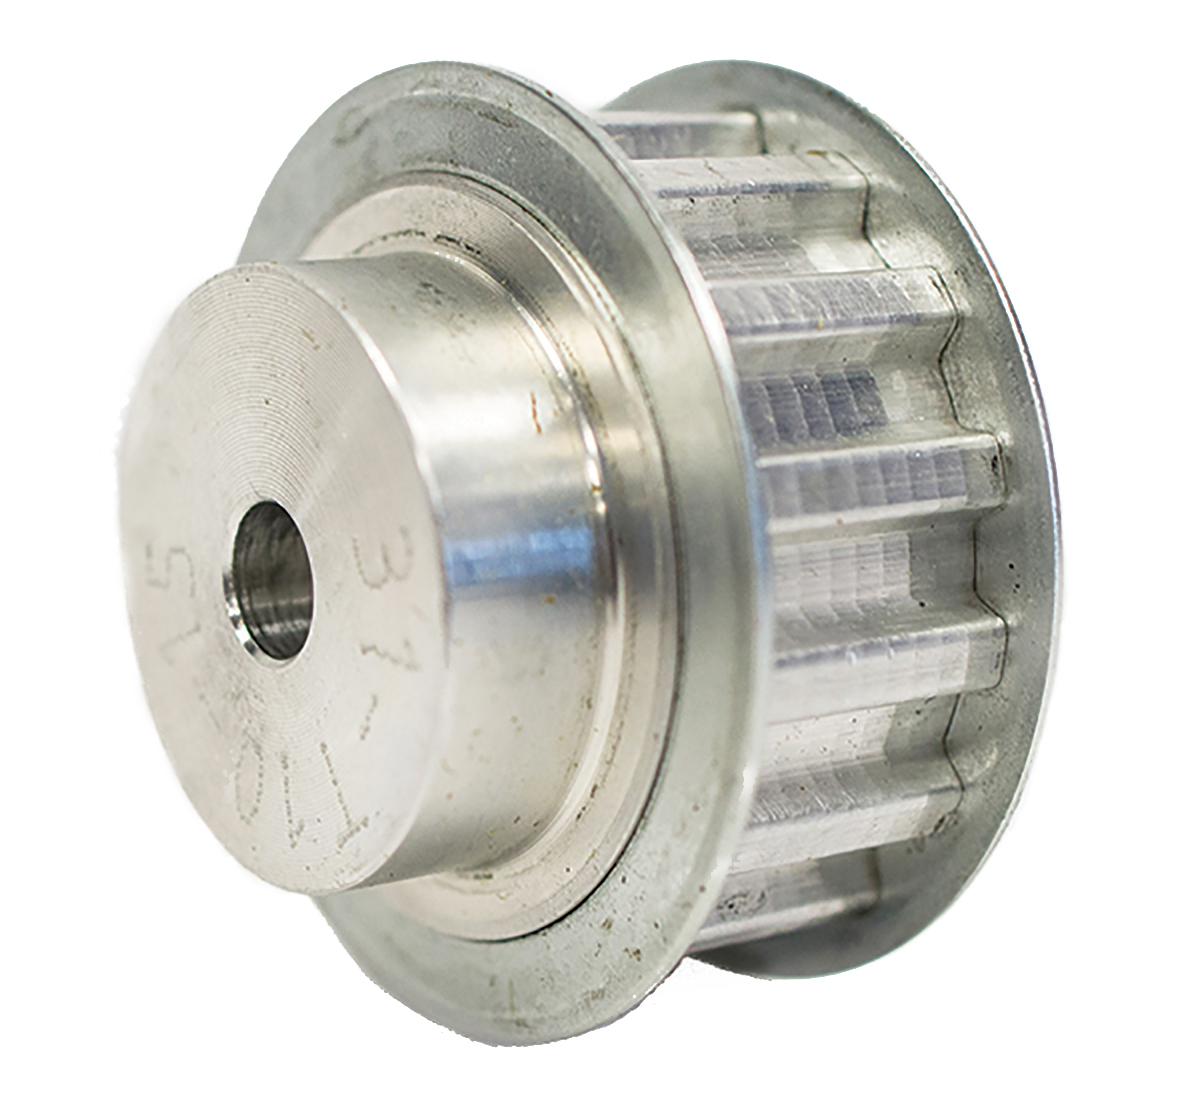 31T10/16-2 - Aluminum Metric Pulleys